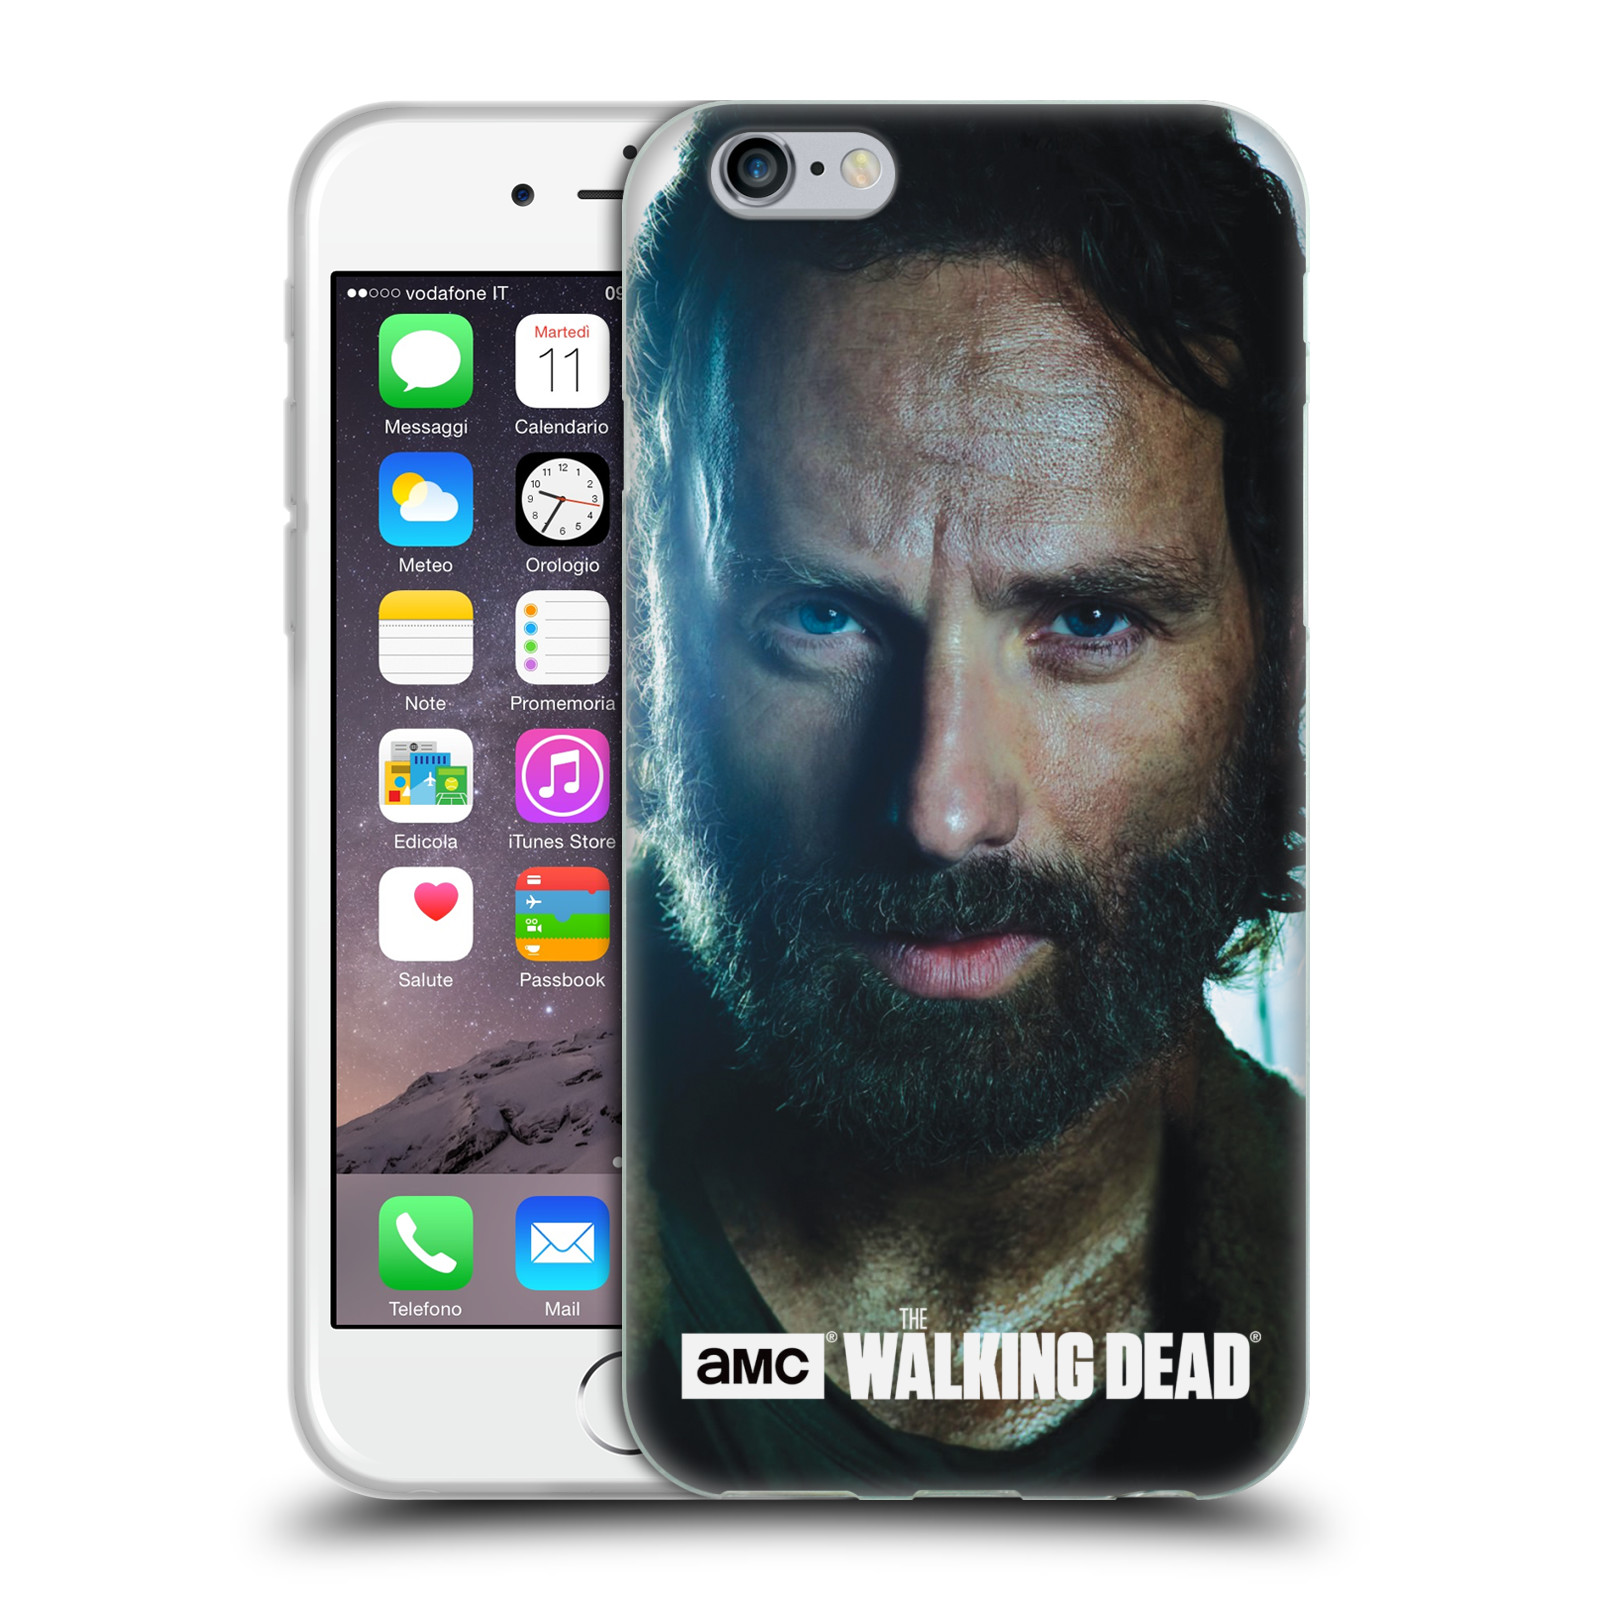 HEAD CASE silikonový obal na mobil Apple Iphone 6 / 6S originální potisk Walking Dead postavy Rick